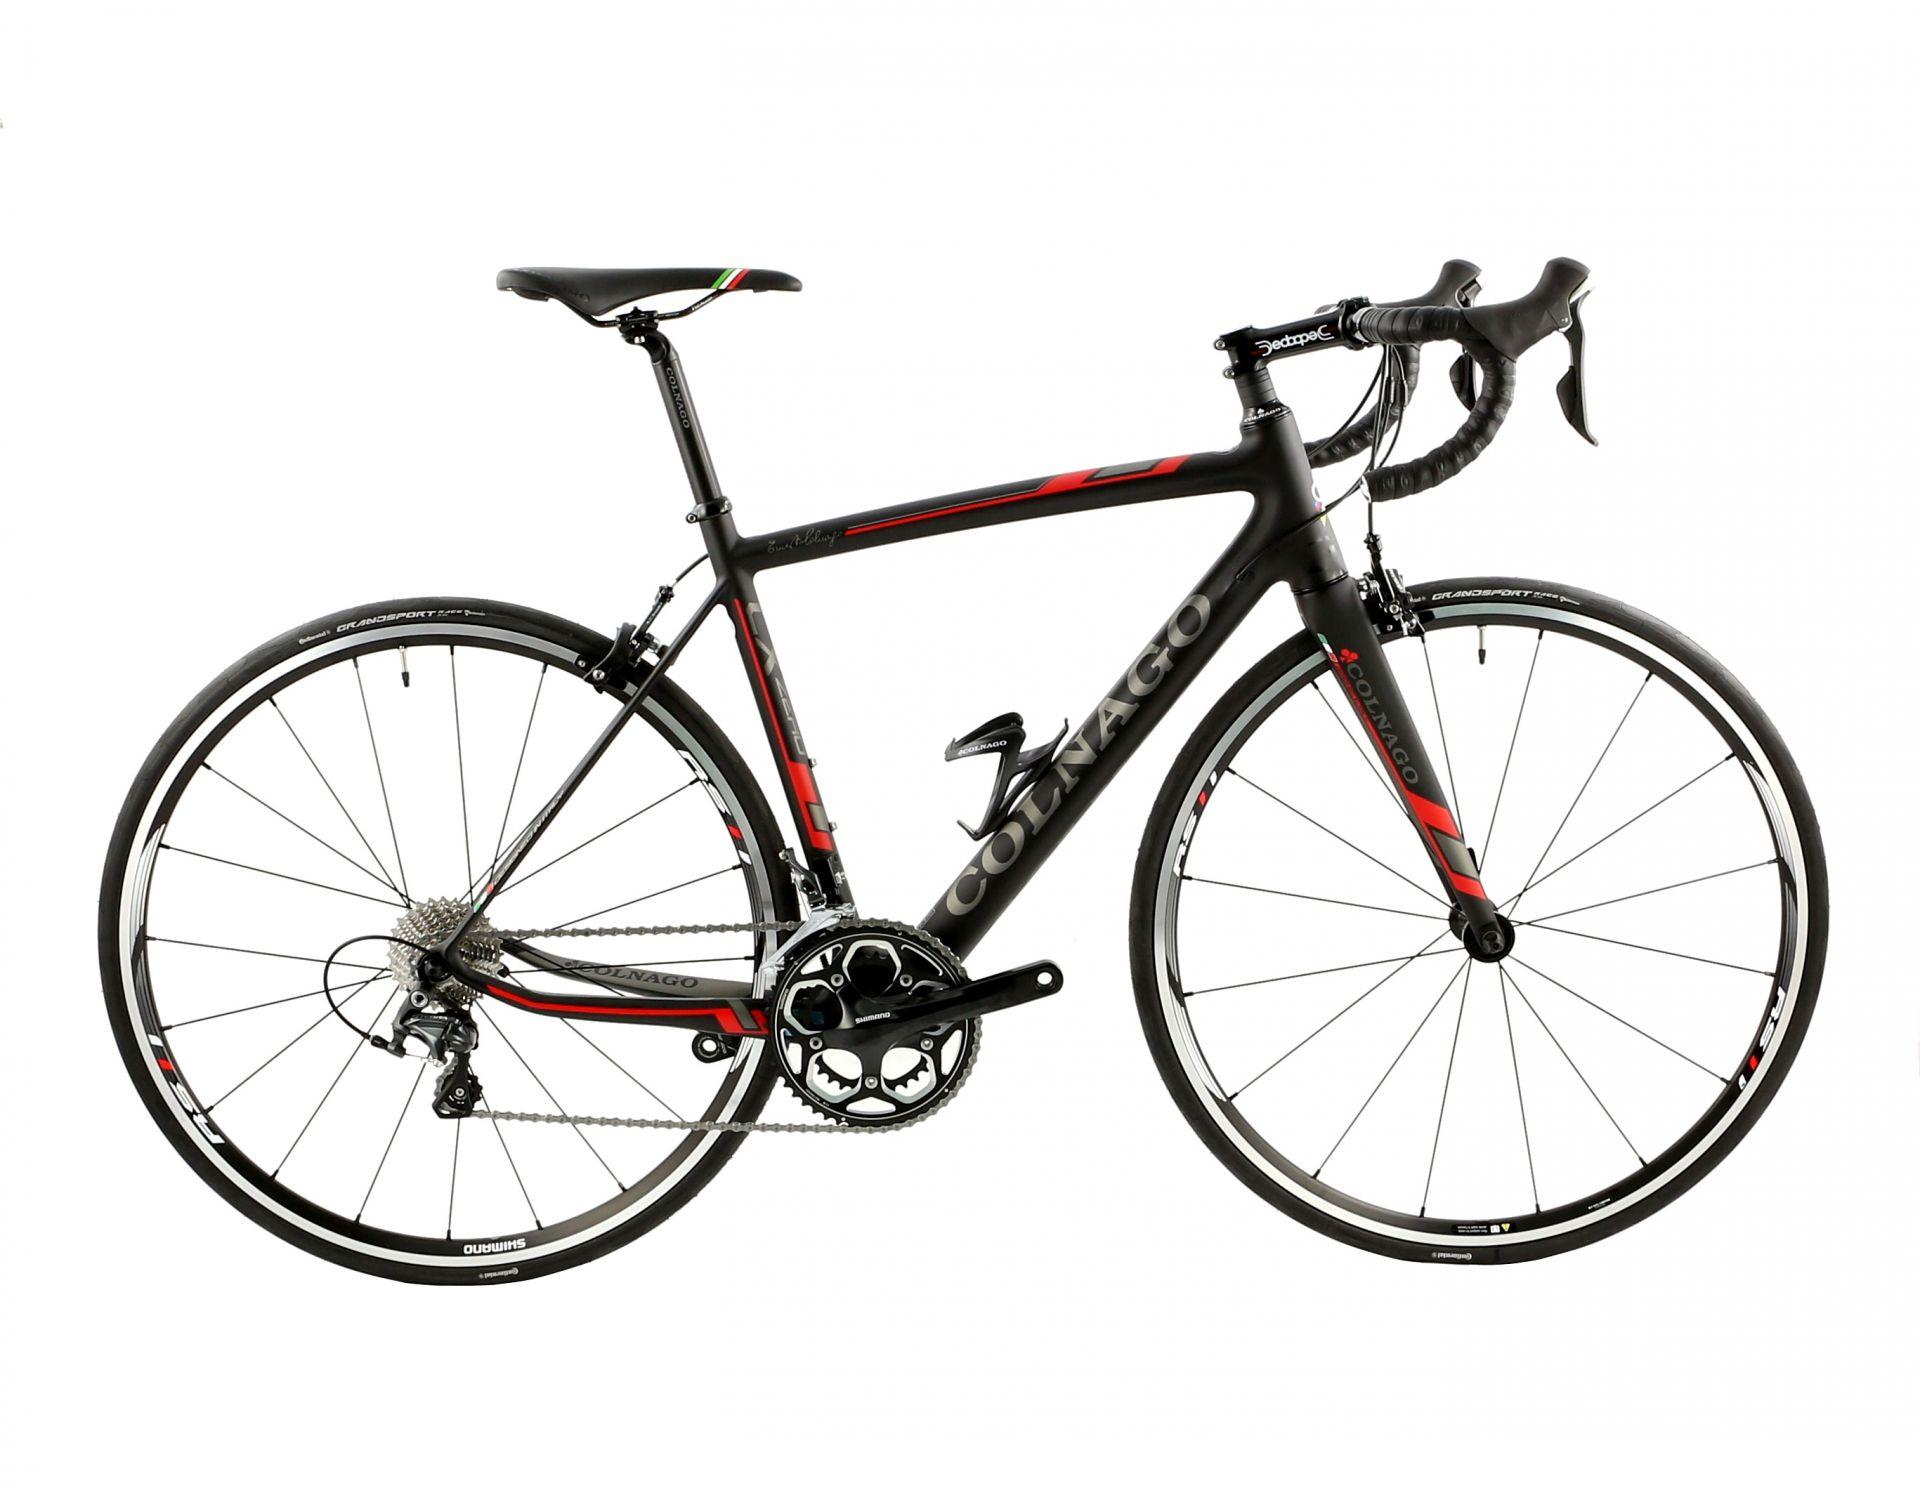 Vélo Colnago CX Zero Ultegra mix 11s / Sh. WH-RS11 (LABR) 2015 - 480S